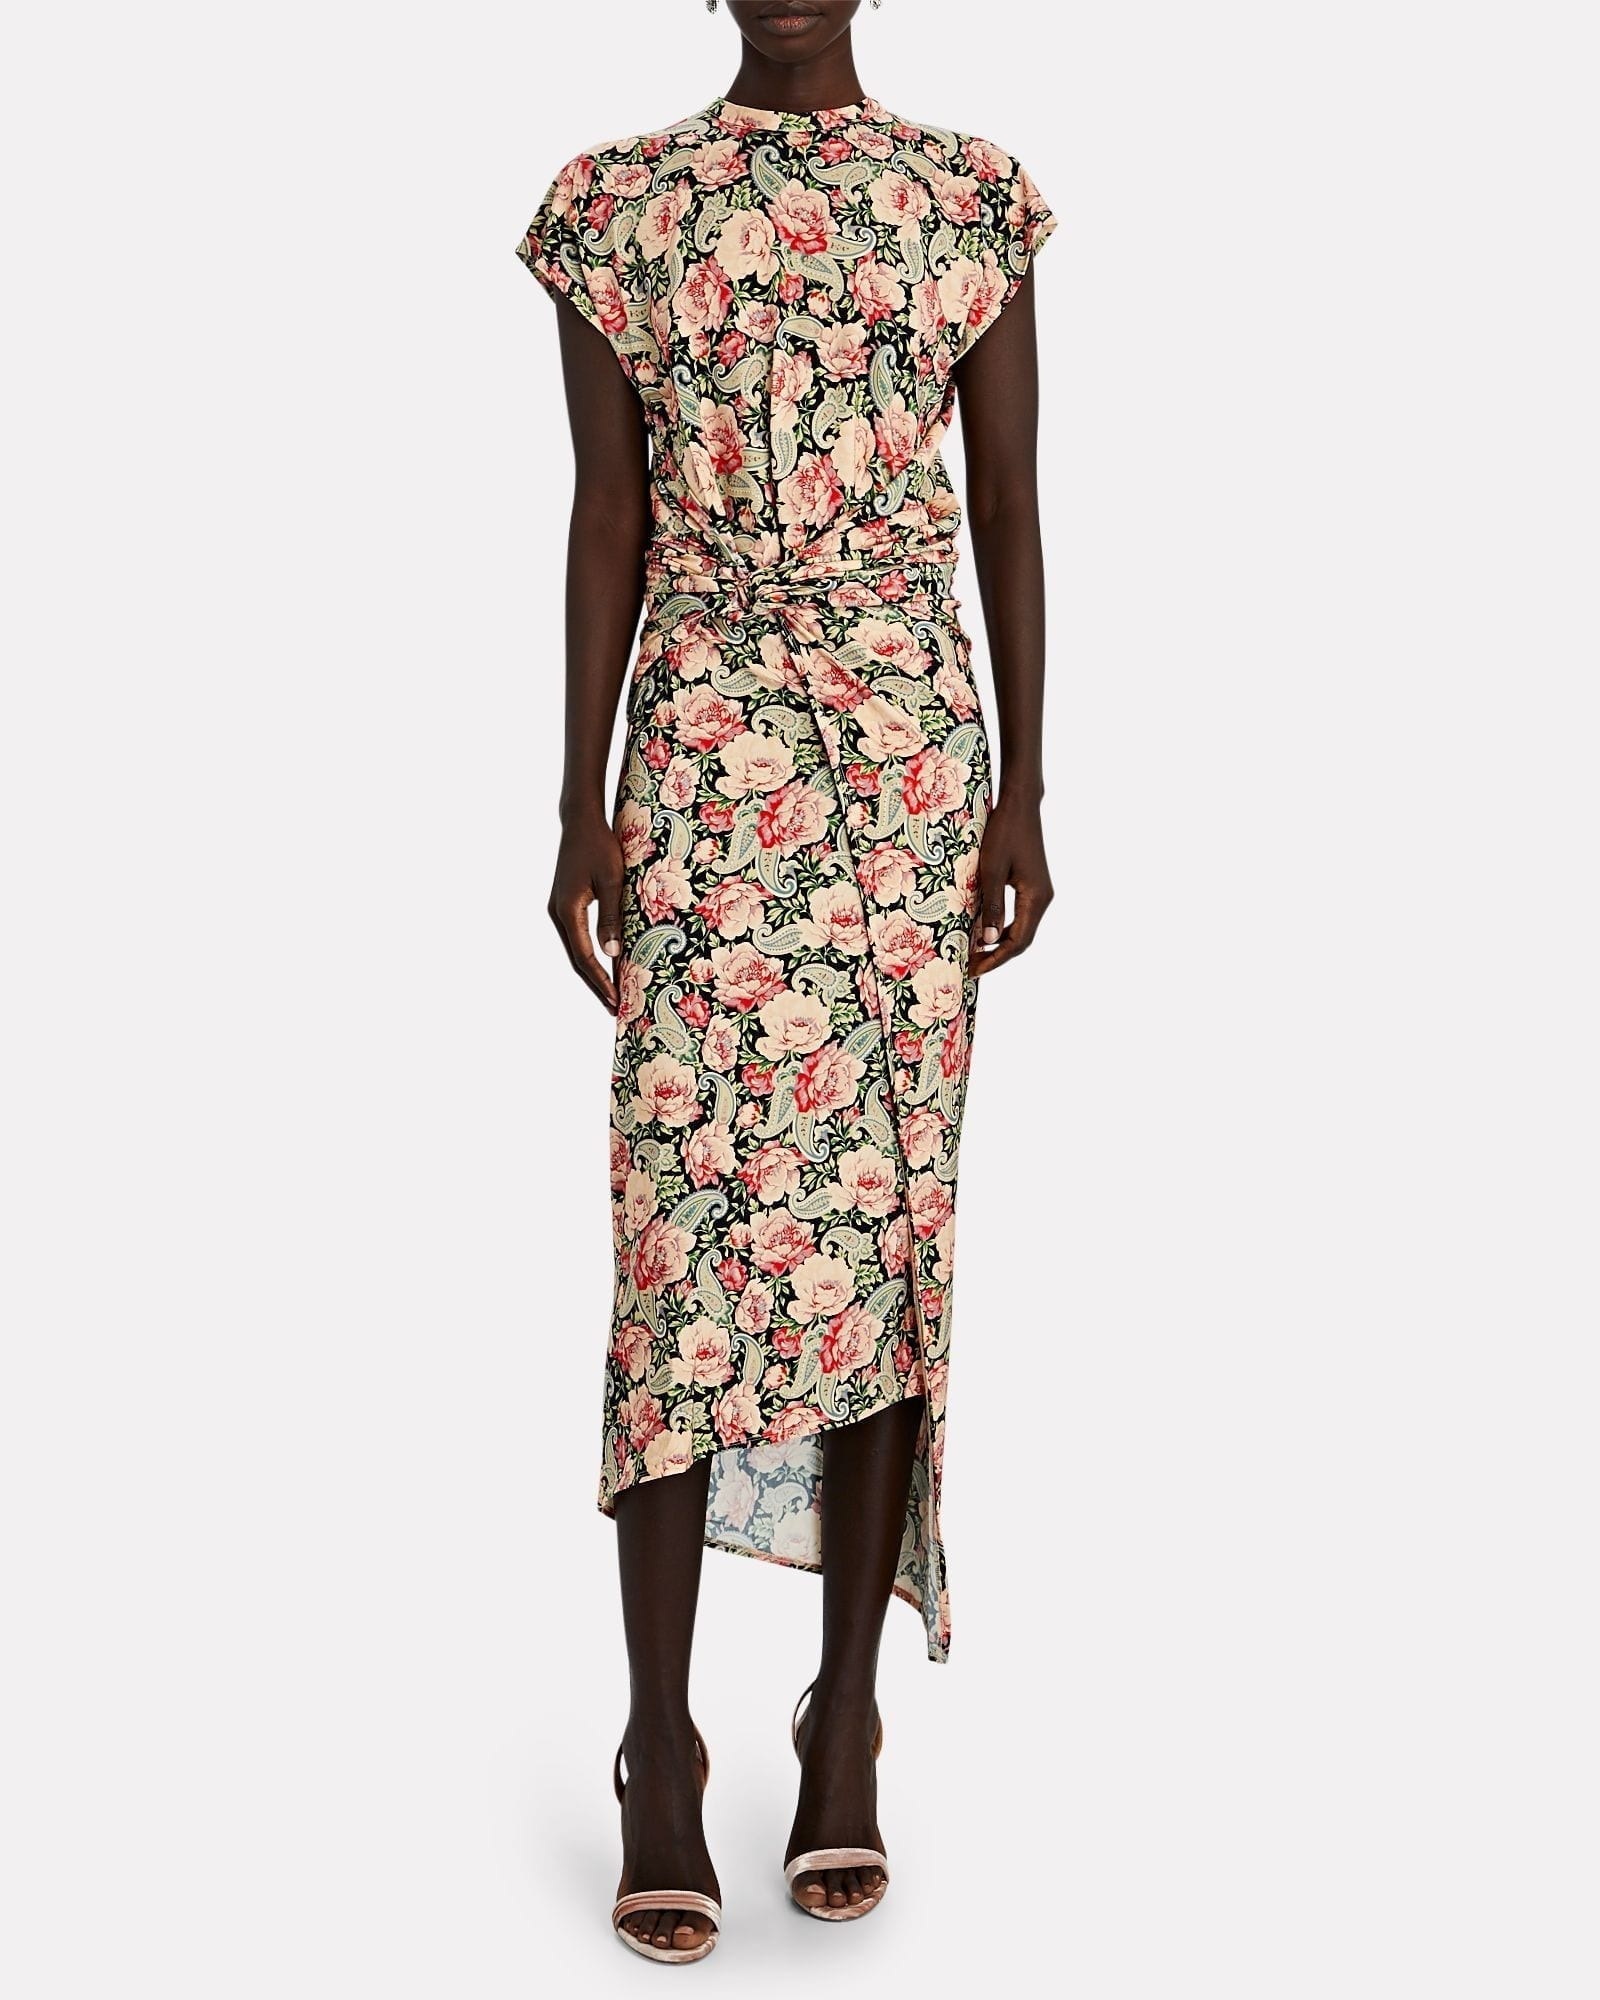 PACO RABANNE Floral Paisley Wrap Midi Dress